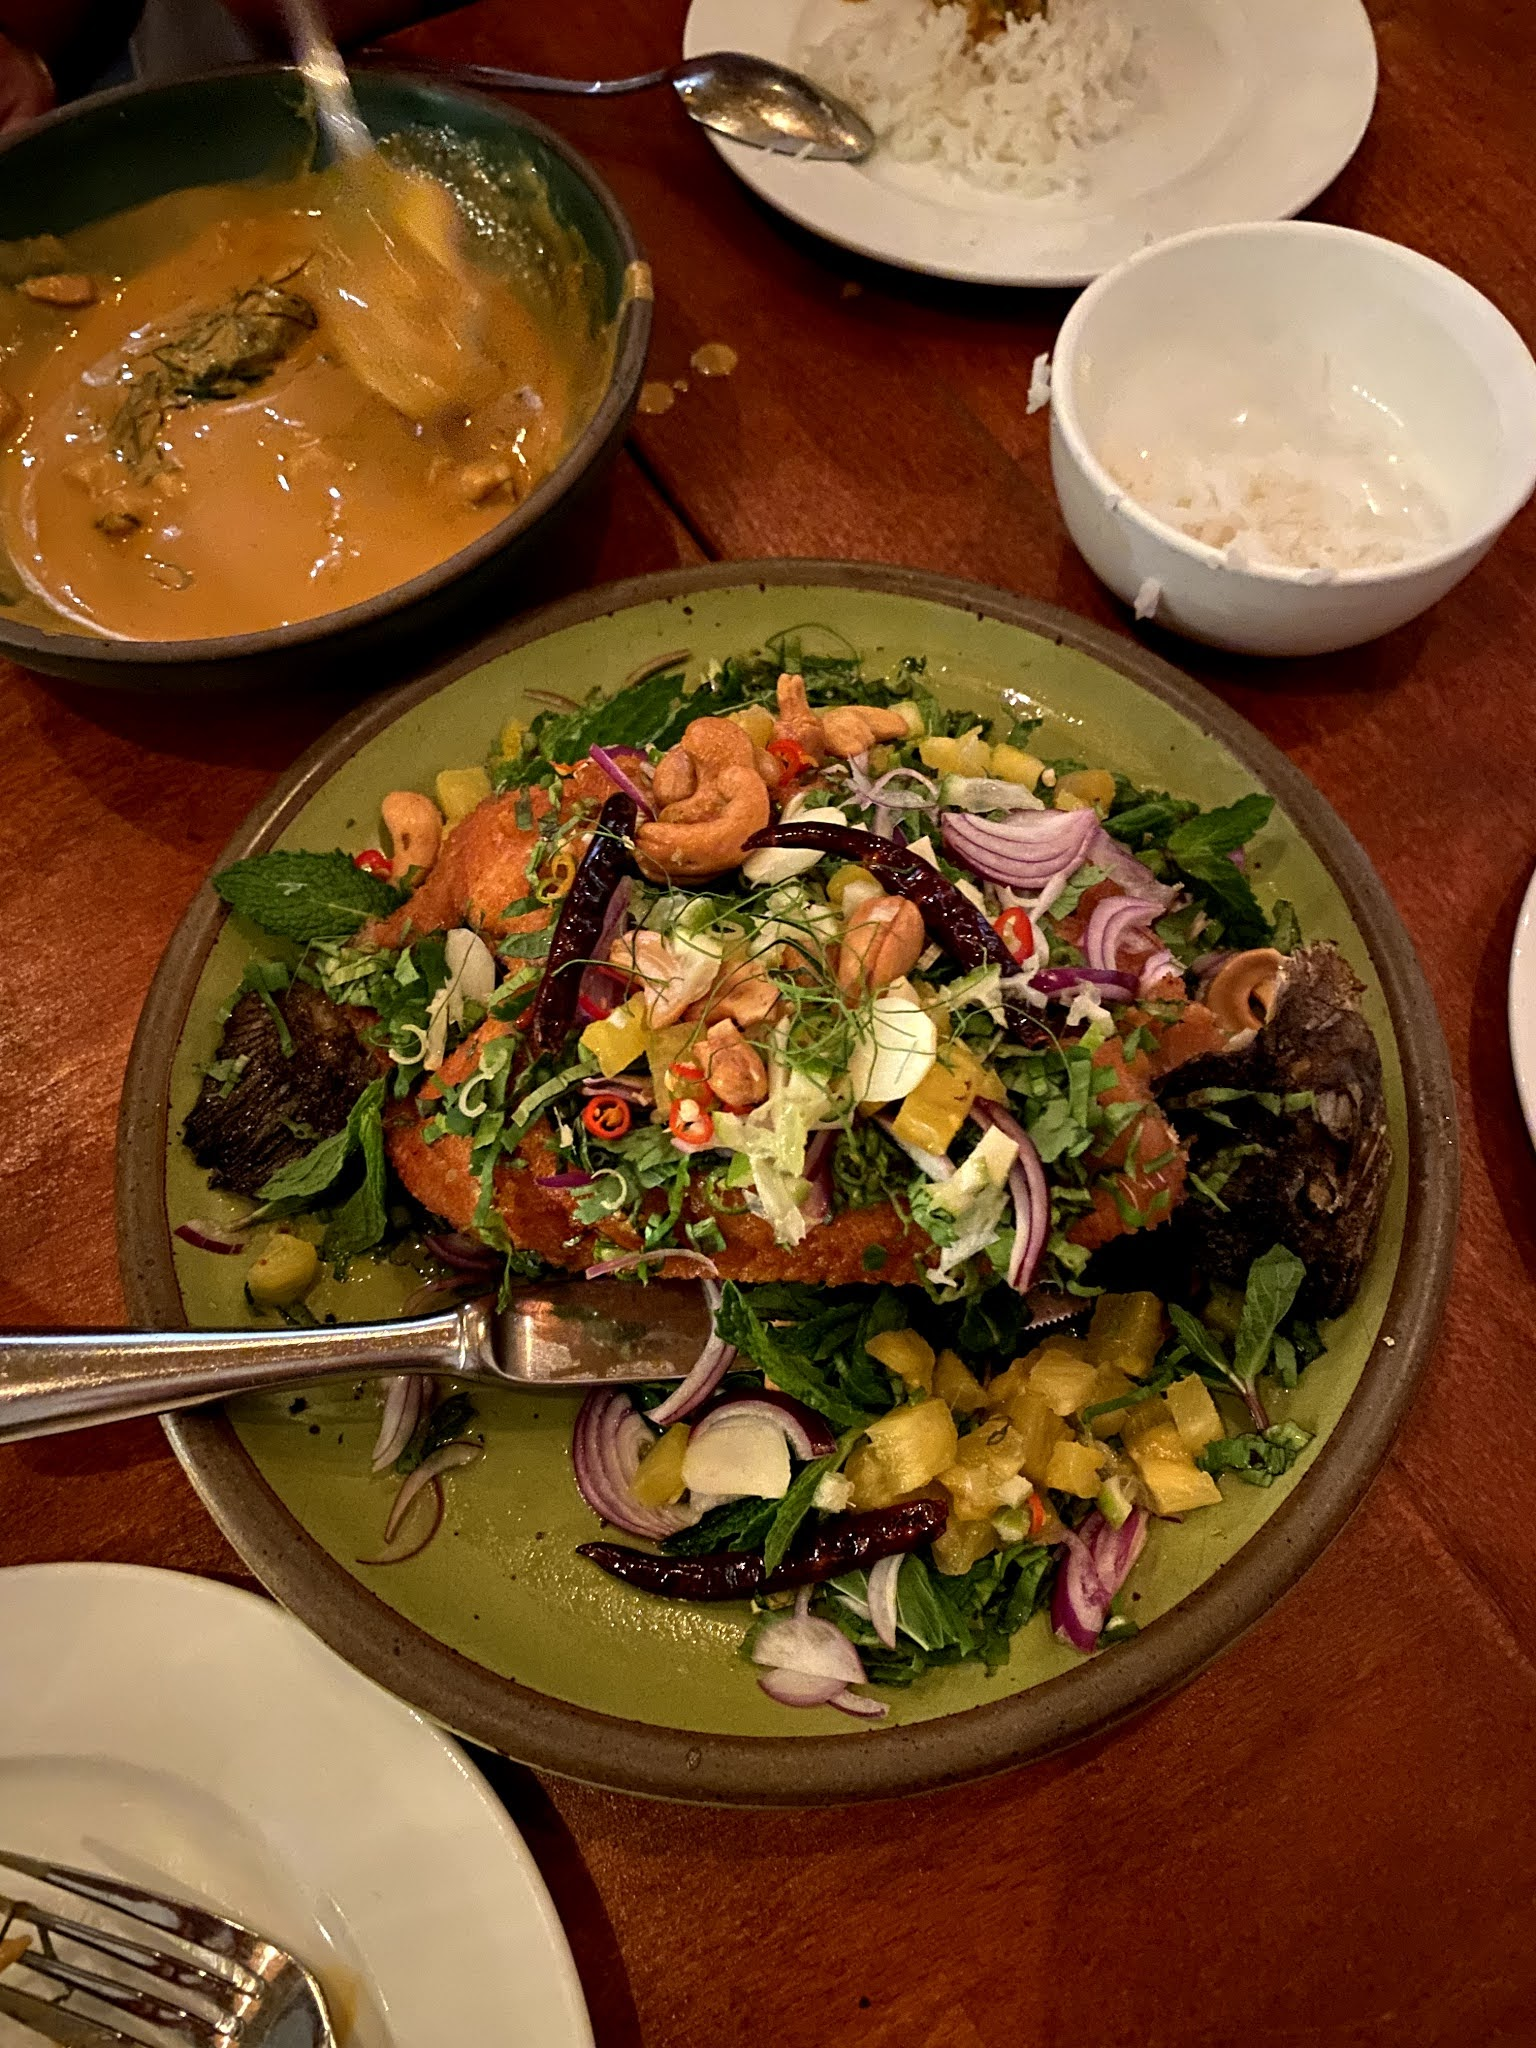 fried fish at fish cheeks bowery fran acciardo nyc restaurants